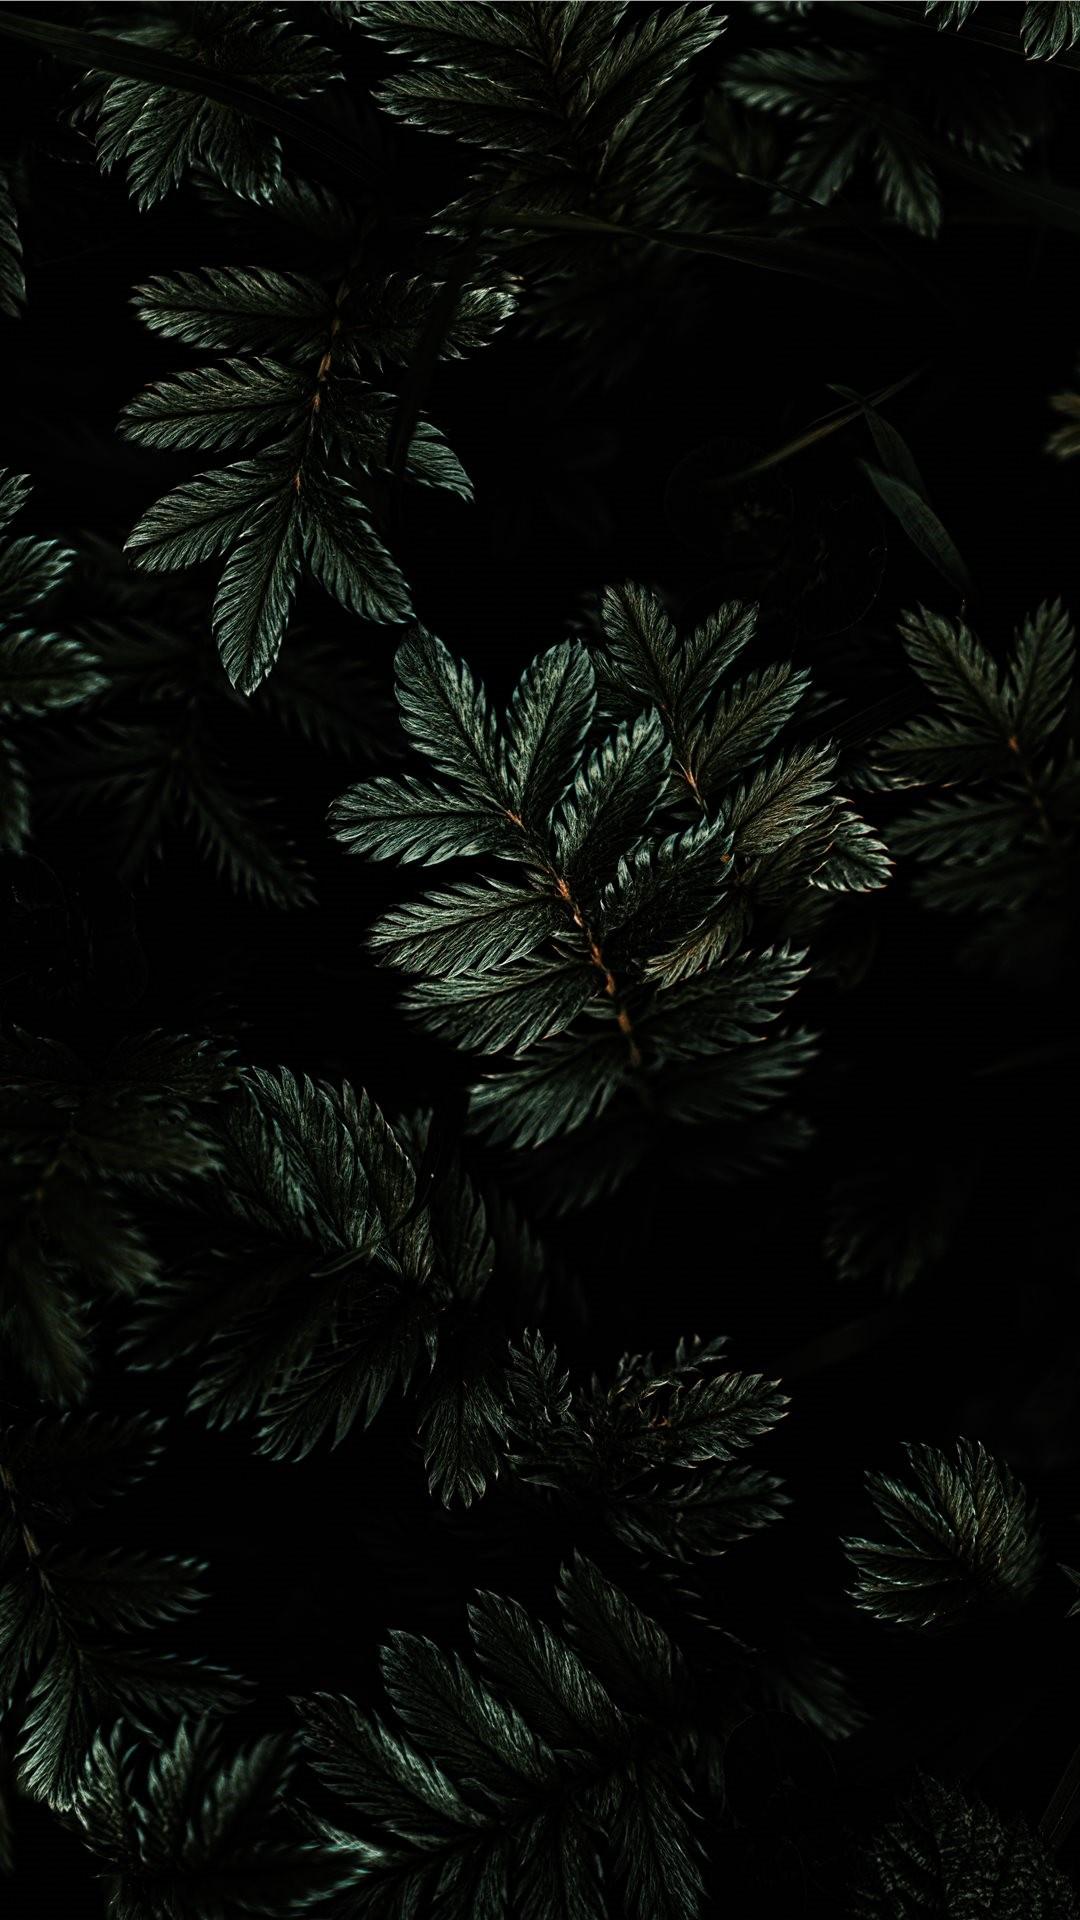 Dark wallpaper for iphone